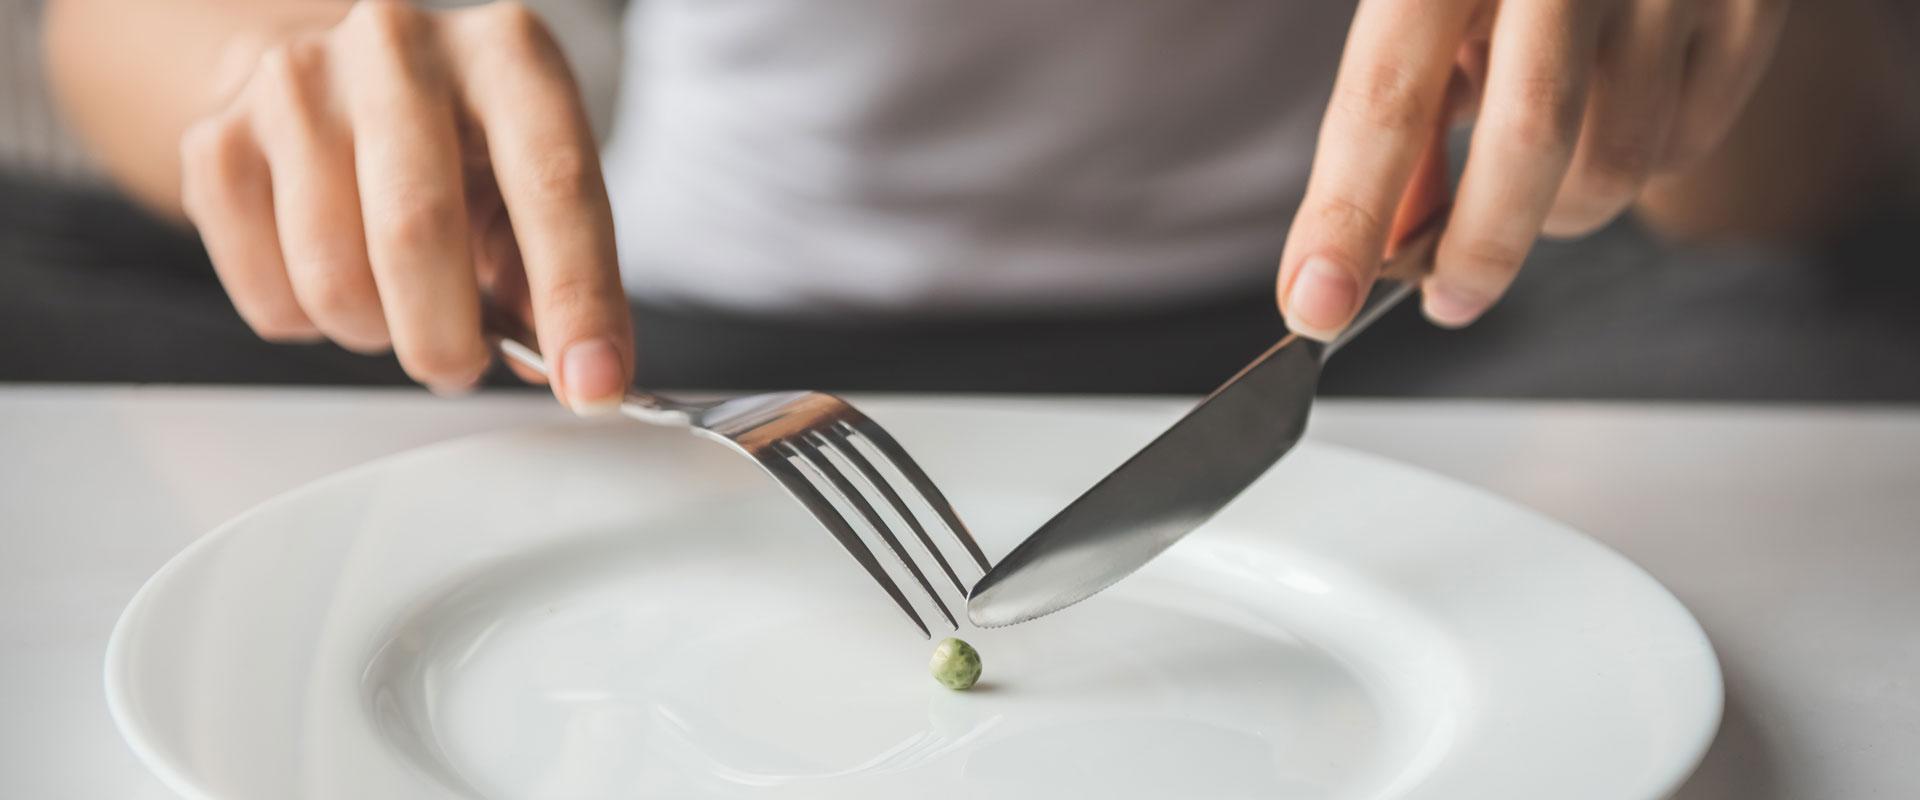 Ratgeber zur Notfallvorsorge – Teil 2 – Lebensmittel